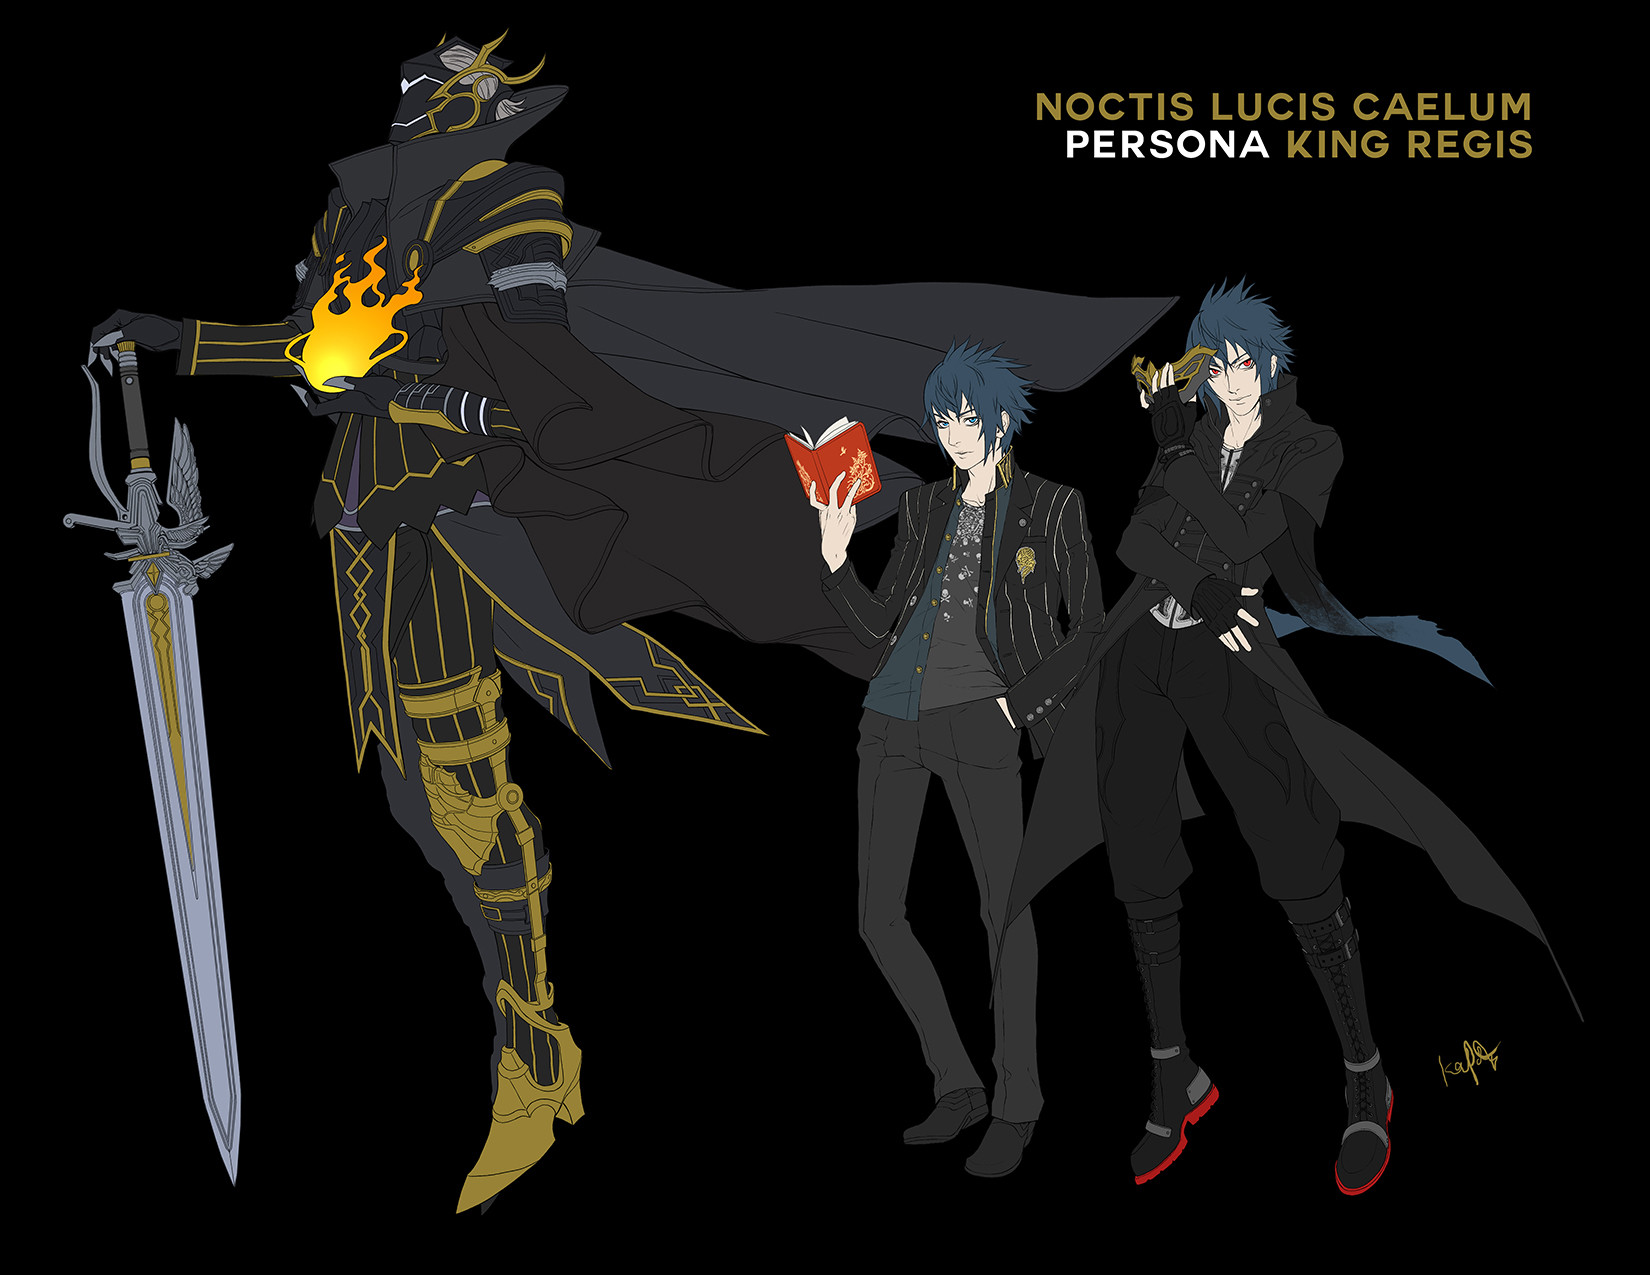 Artstation Final Fantasy Xv X Persona 5 Crossover Character